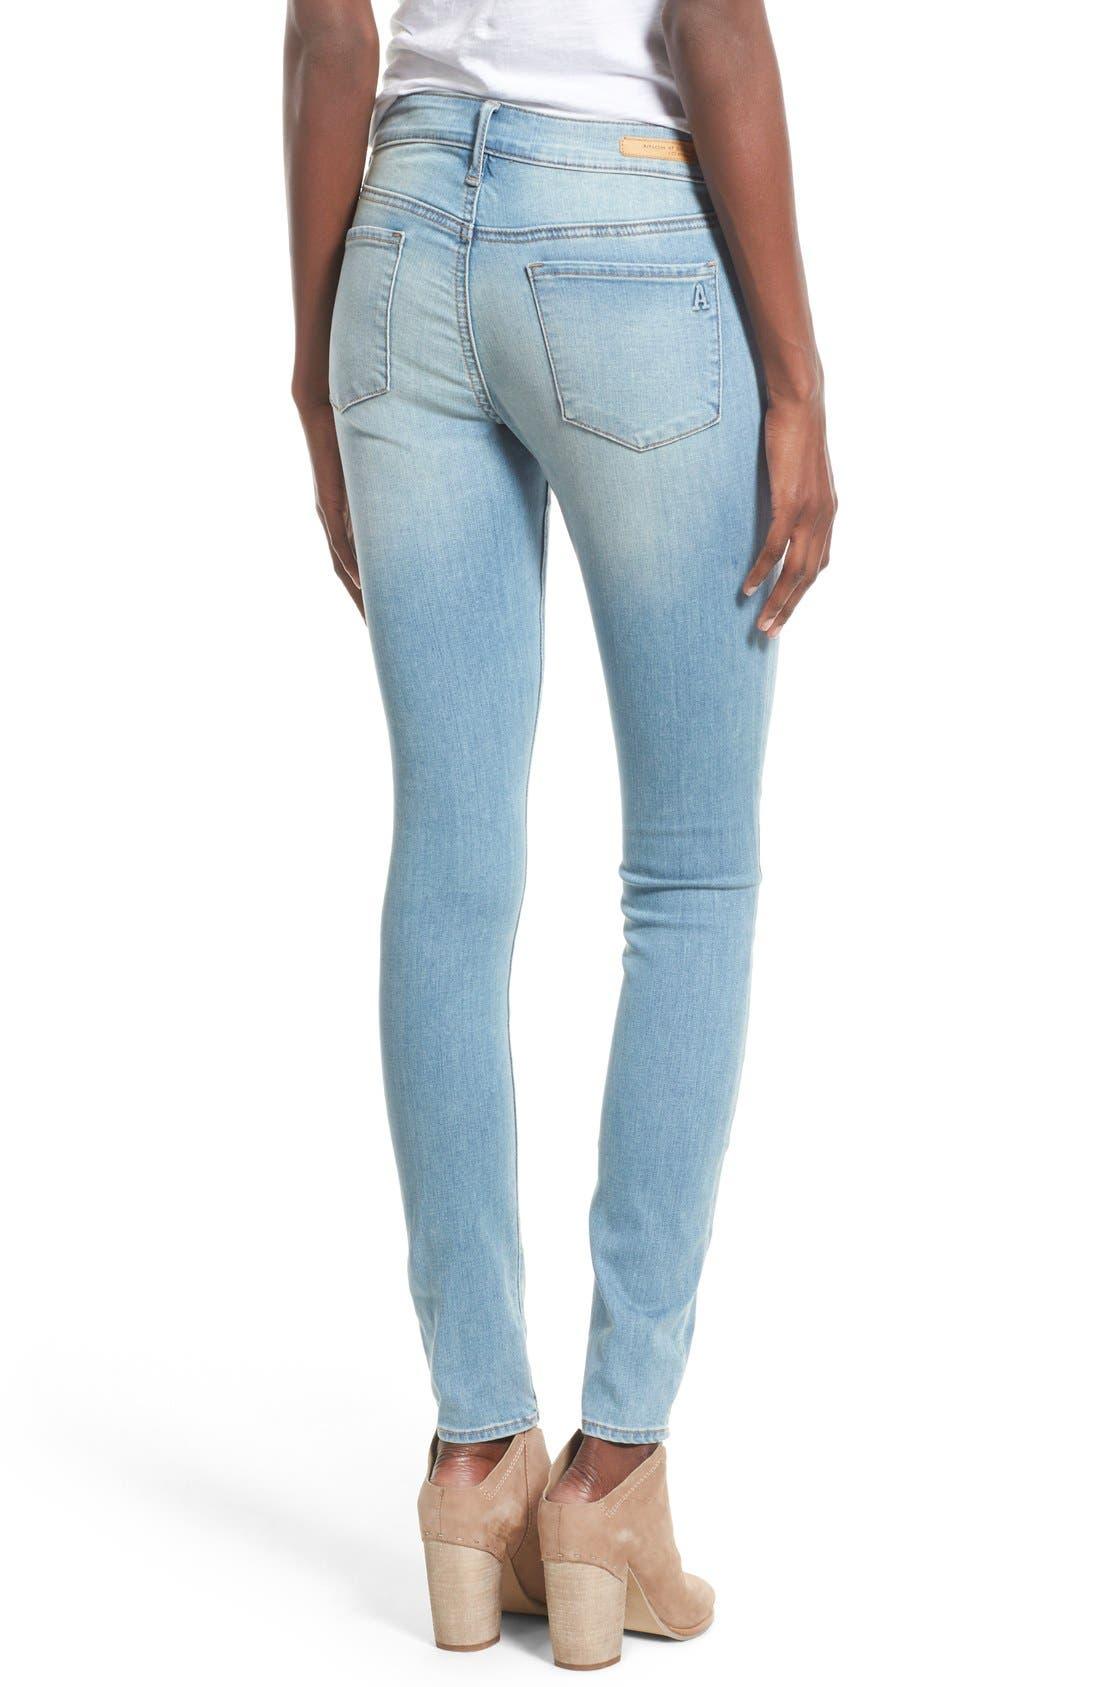 Alternate Image 2  - Articles of Society 'Mya' Skinny Jeans (Indigo Wash)